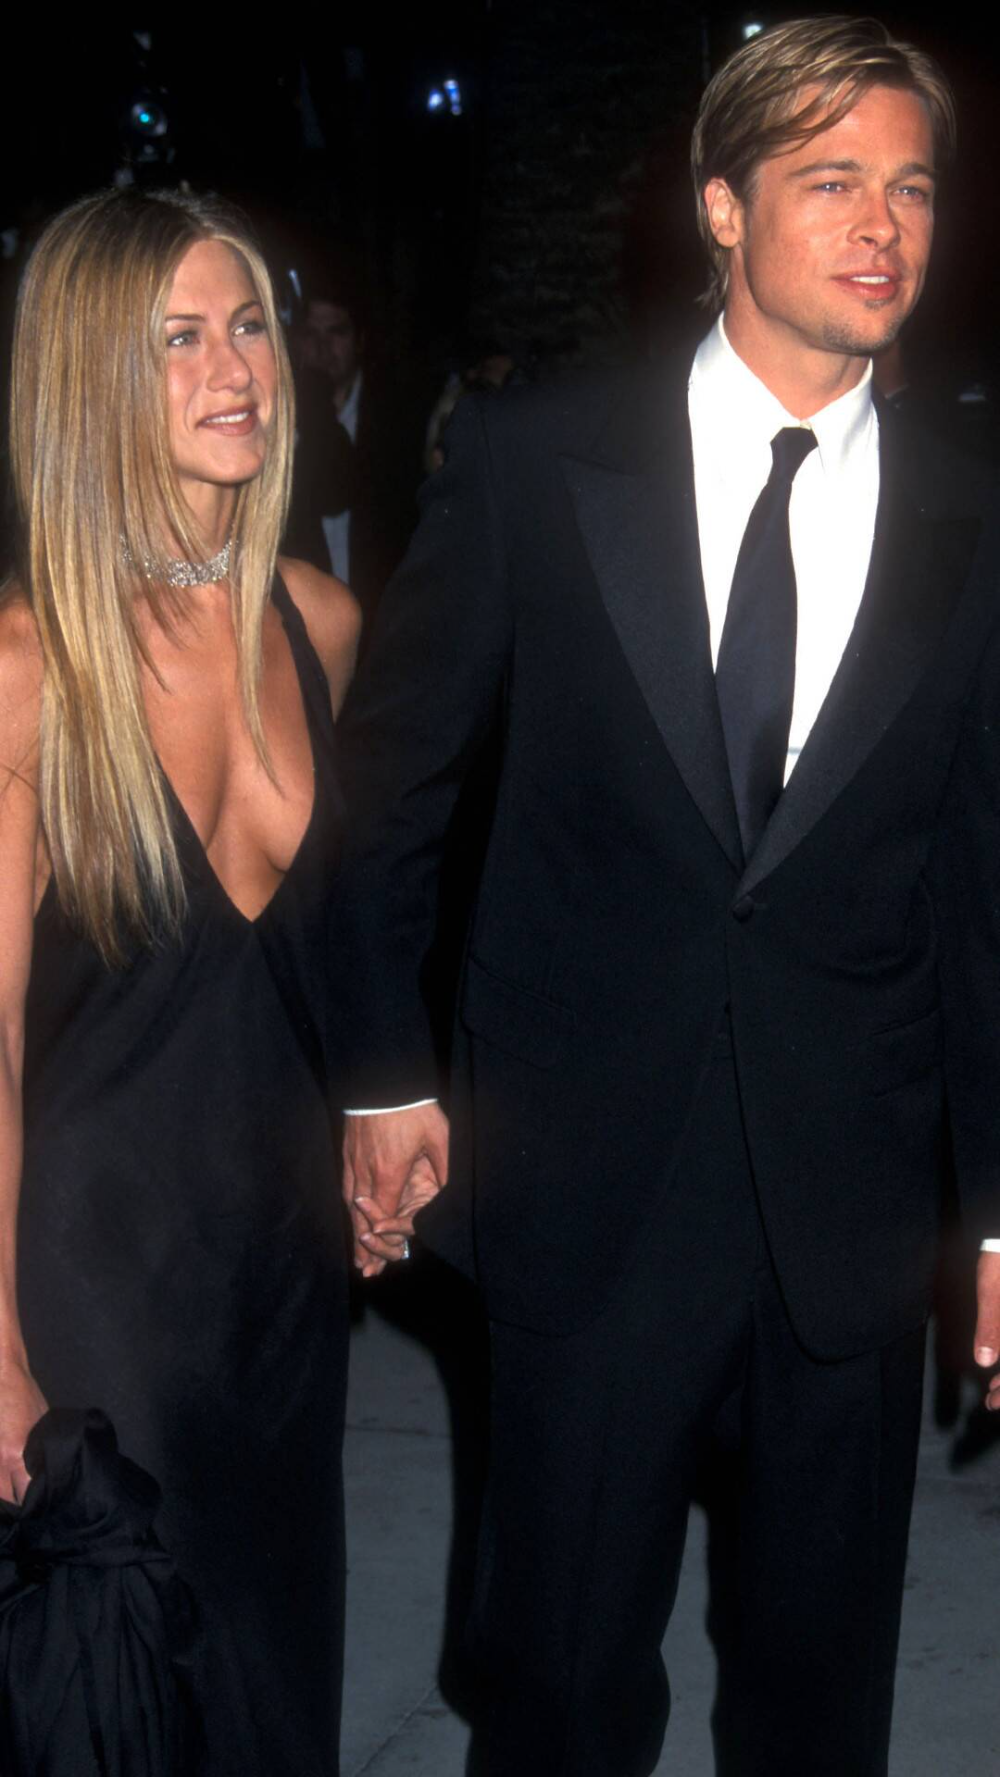 Fotos De Flashback Jennifer Aniston Y Brad Pitt Juntos E Online Latino In 2021 Jennifer Aniston Young Brad Pitt And Jennifer Brad Pitt Jennifer Aniston